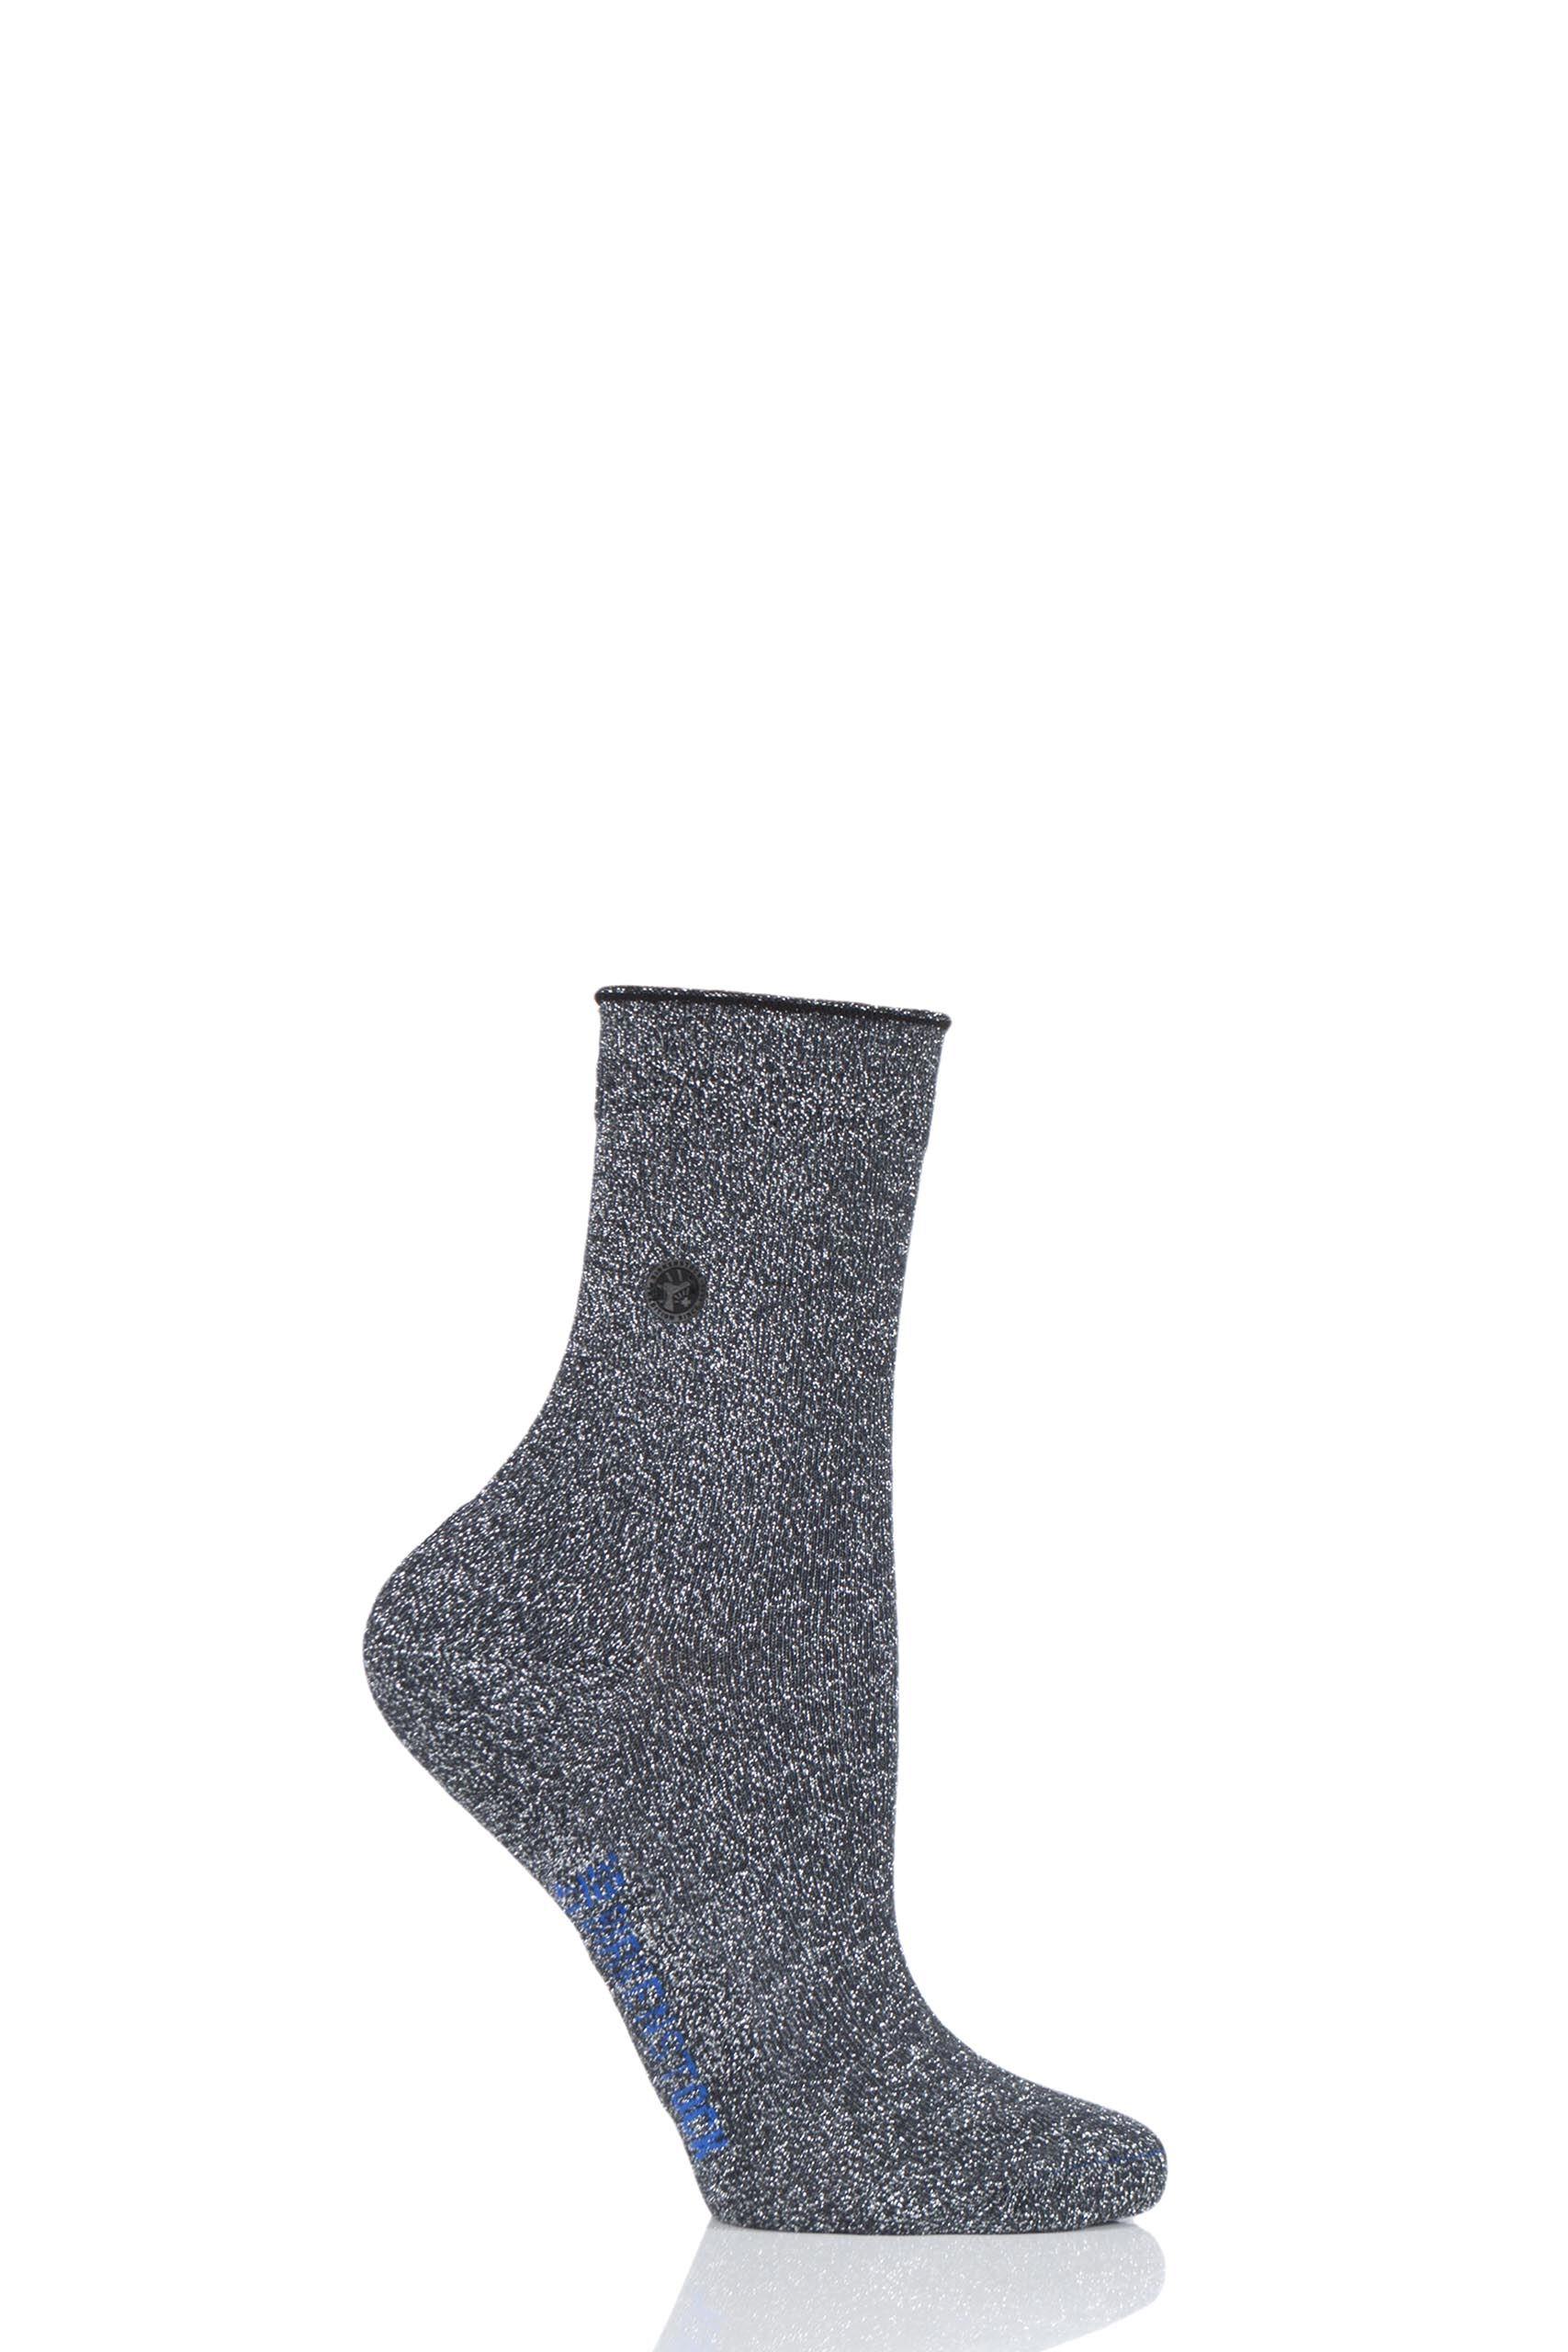 Image of 1 Pair Anthracite Cotton Sole Bling Socks Ladies 3.5-5 Ladies - Birkenstock